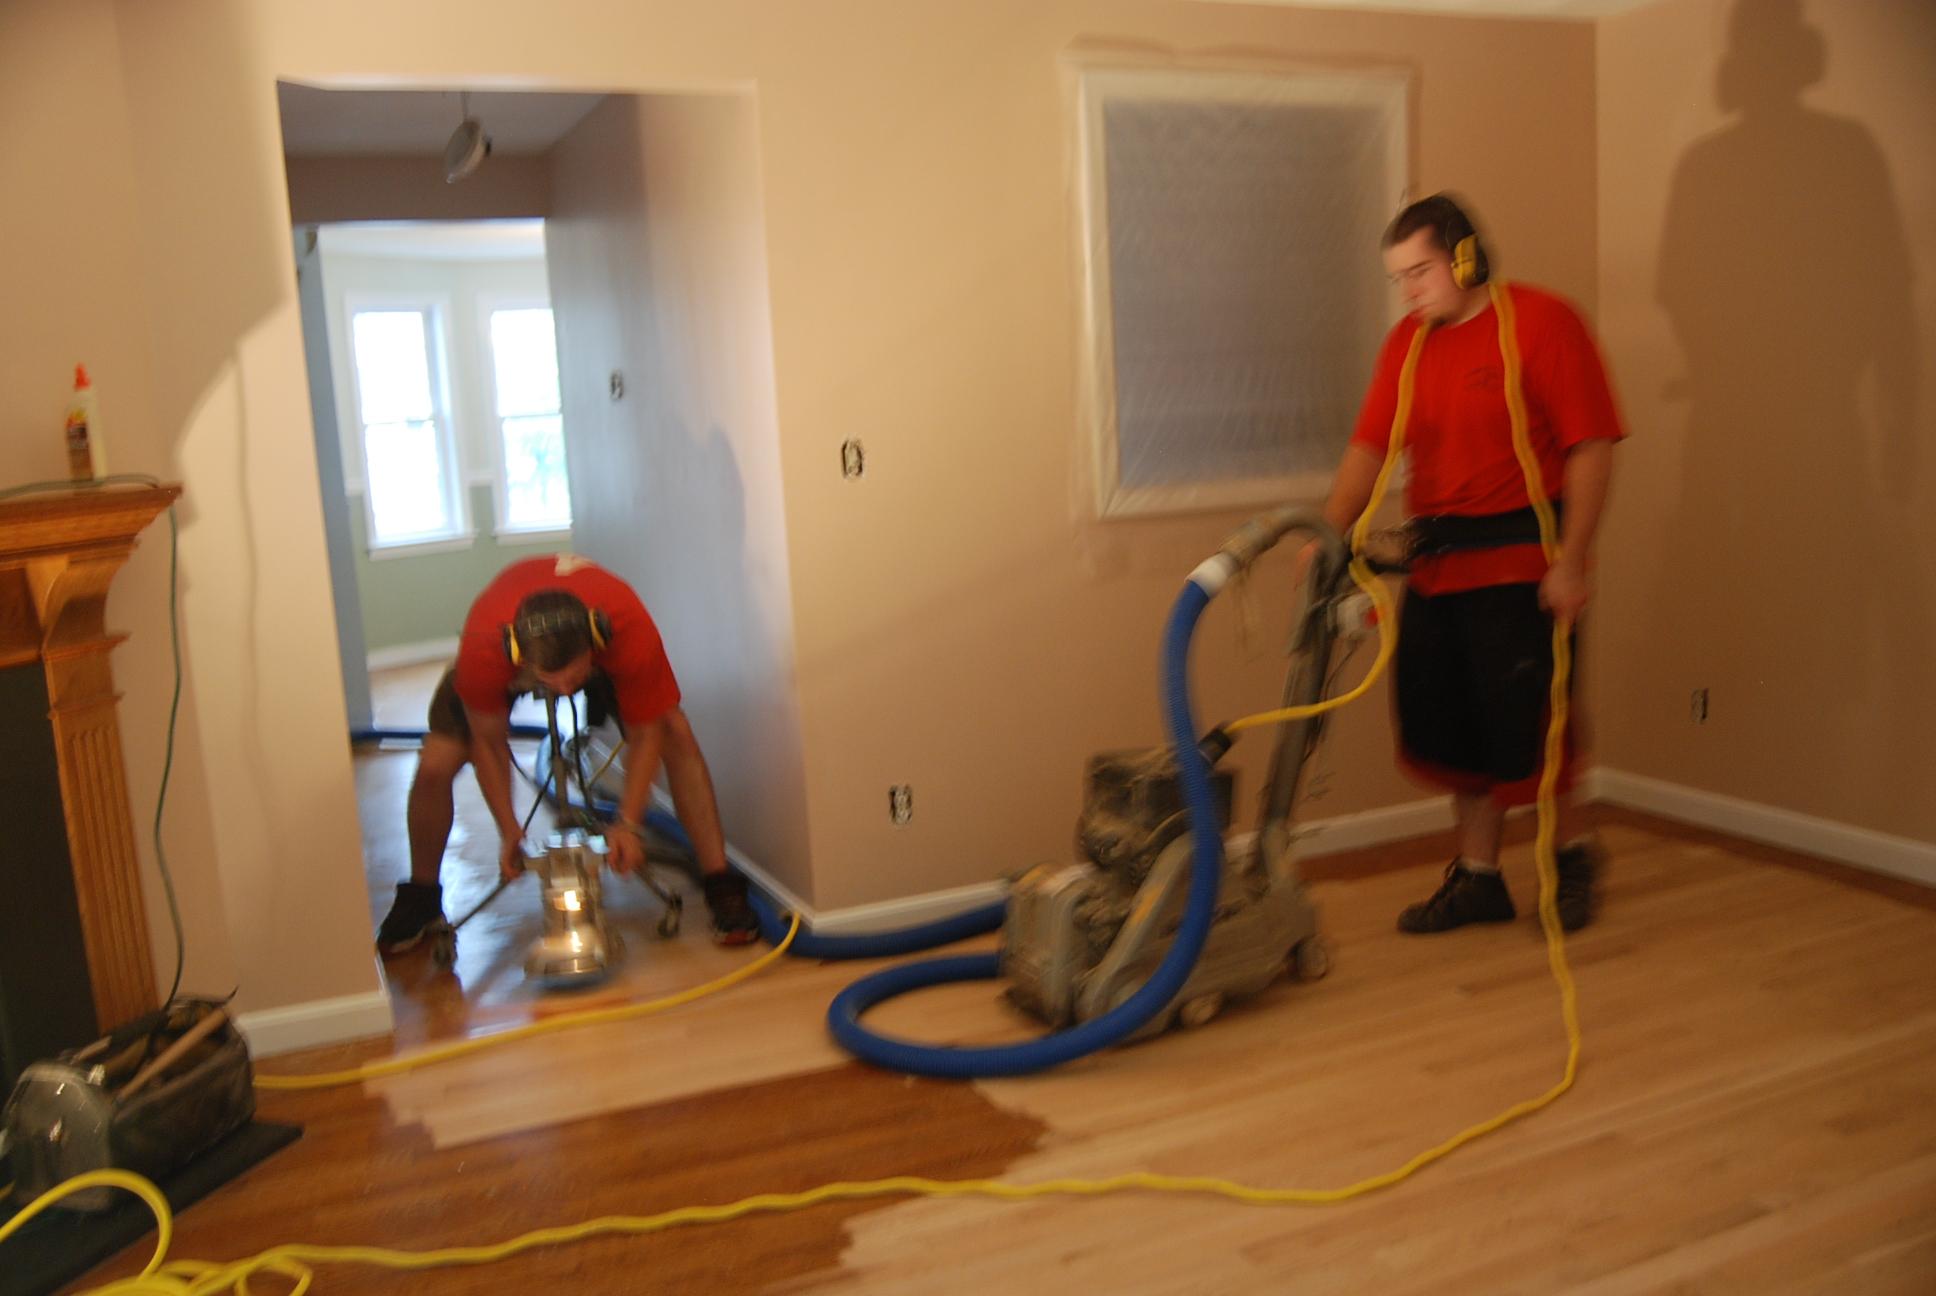 Hardwood Floor Sanders renting a hardwood floor sander Hardwood Dustless Floor Sanding In Nh